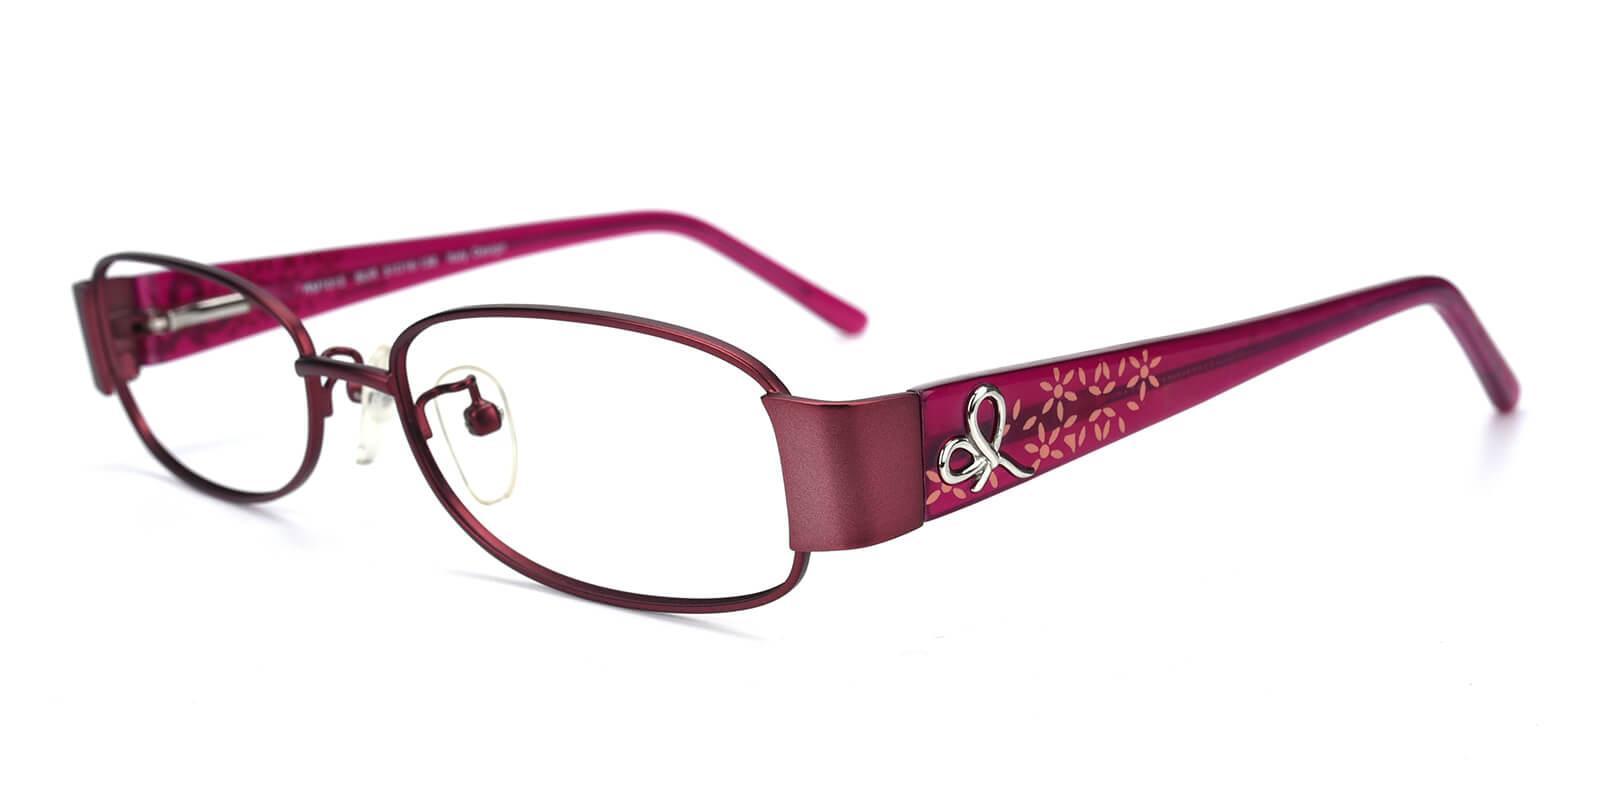 Janniey-Purple-Rectangle-Metal-Eyeglasses-additional1